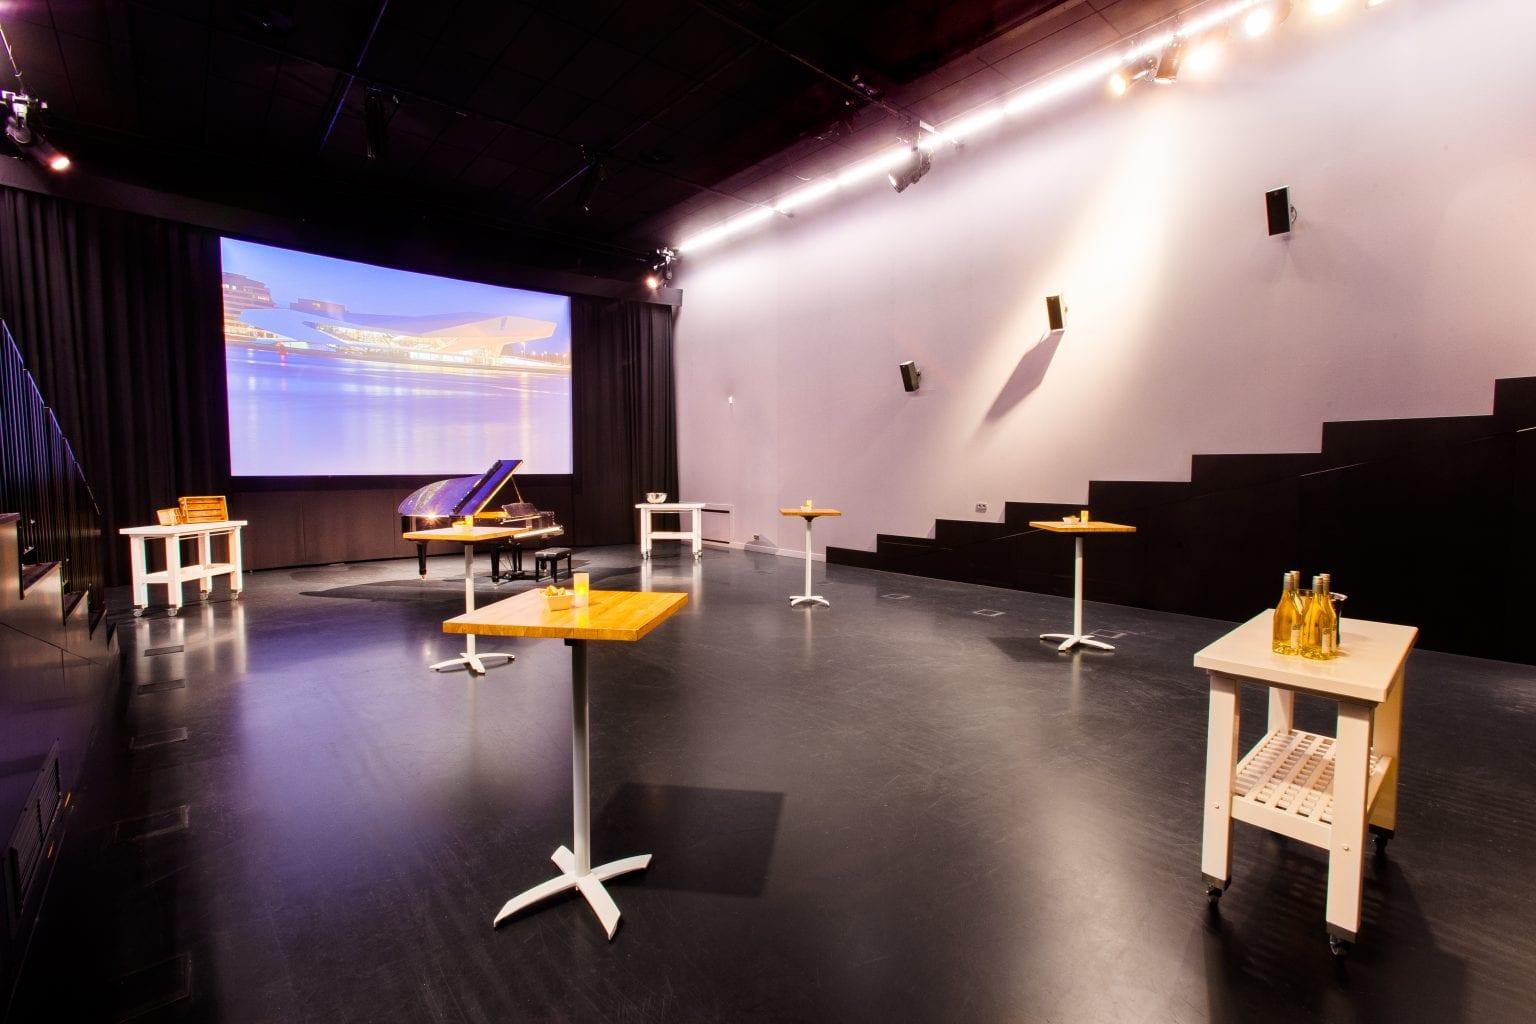 Cinema 2 - flexible seating